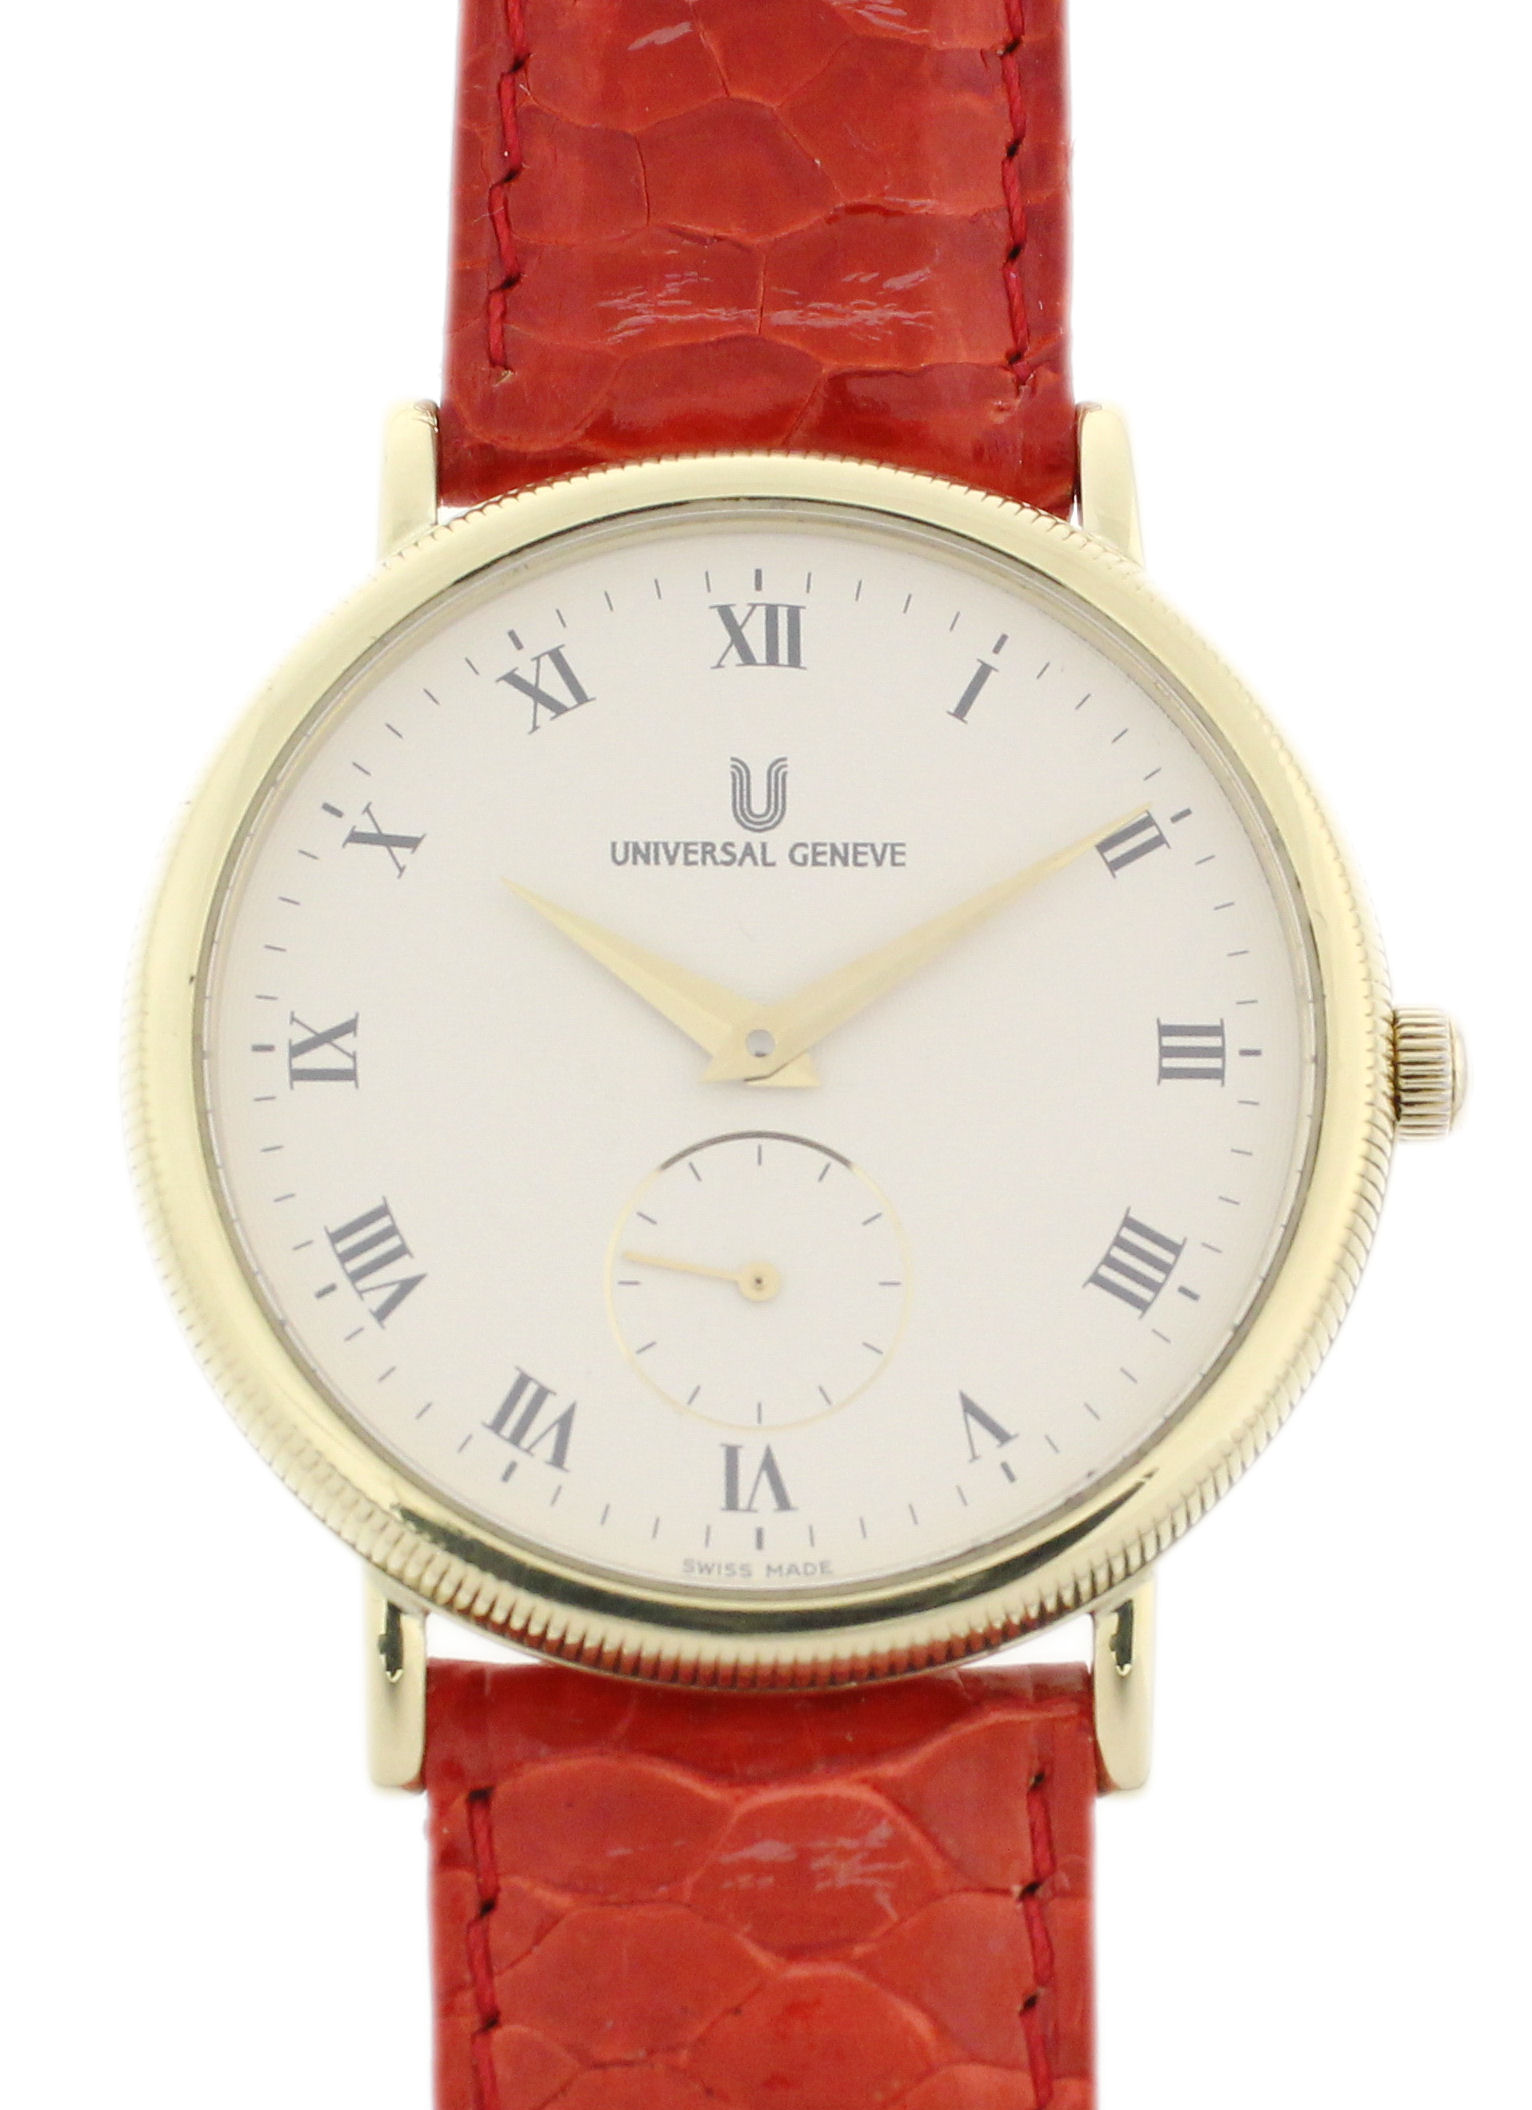 universal geneve 18ct gold herren armbanduhr sehr flach. Black Bedroom Furniture Sets. Home Design Ideas